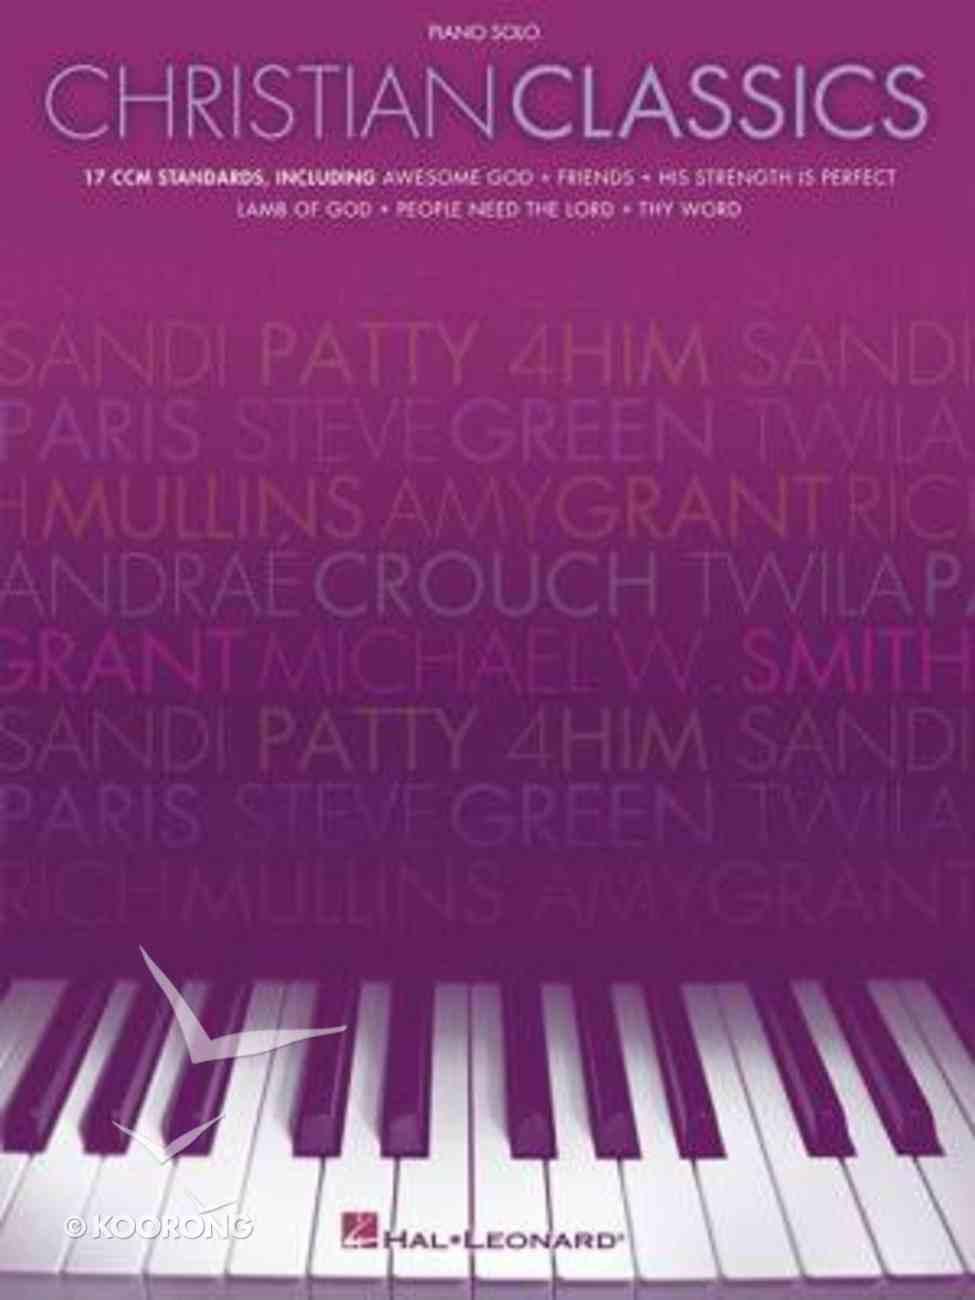 Christian Classics (Music Book) Paperback